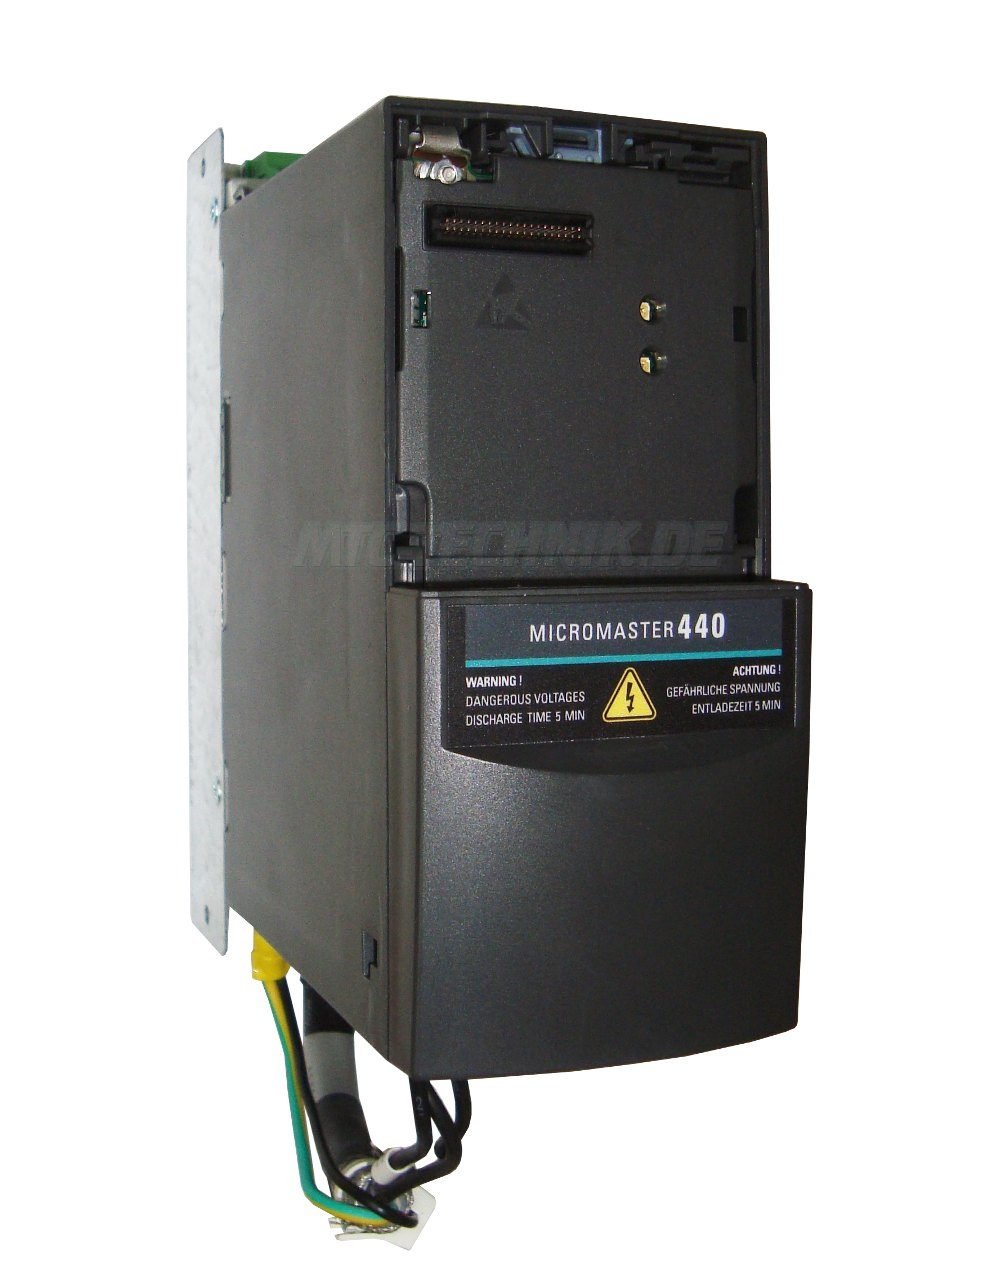 1 Online Shop Siemens 6se6440-2ud15-5aa1 Micromaster 440